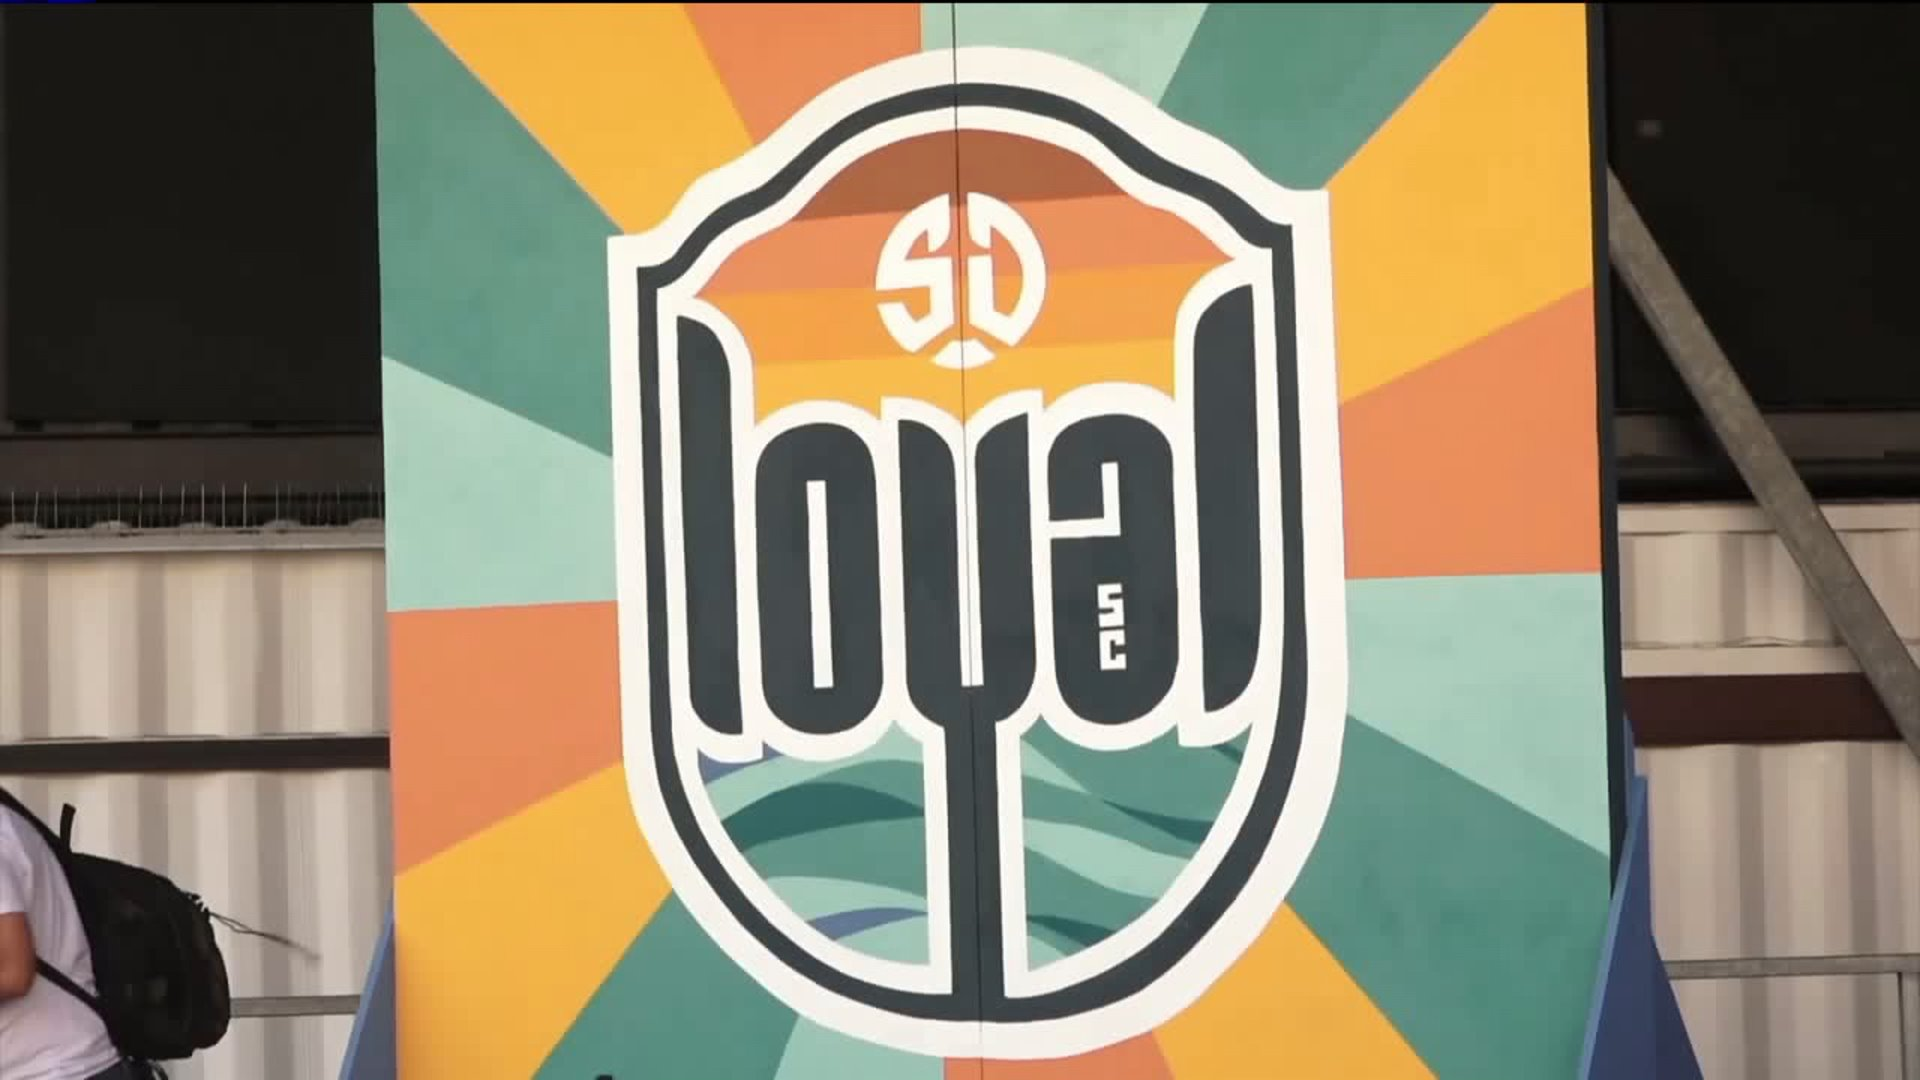 San Diego Loyal postpones match with Las Vegas following ...